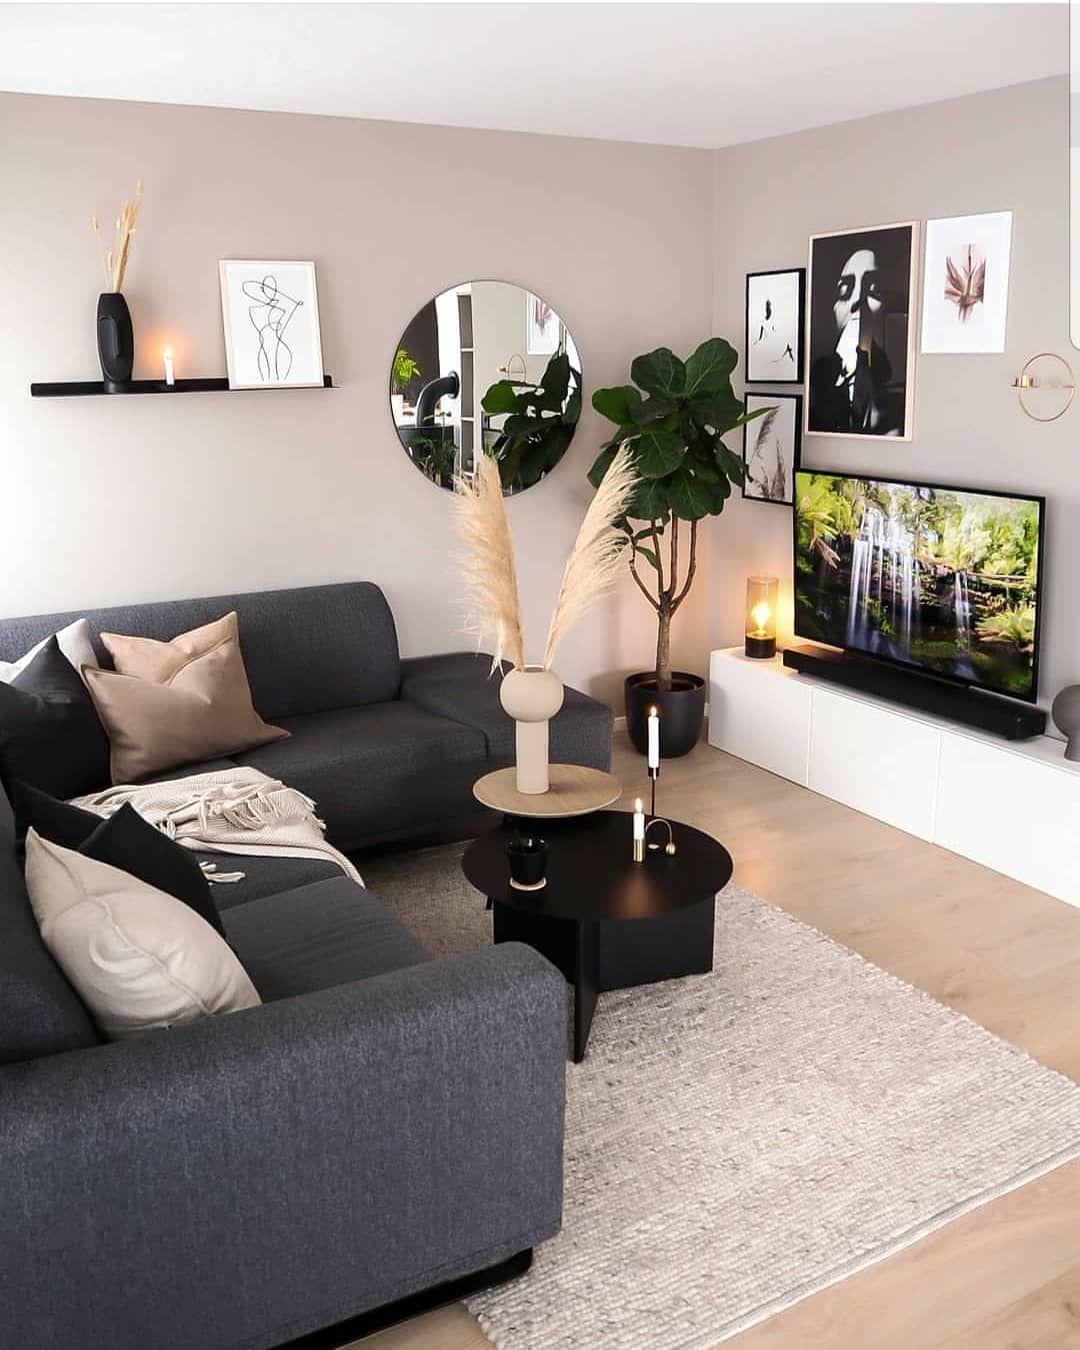 Inspire Me Home Decor Instagram Home Inspiration Inspire Home Small Apartment Decorating Living Room Living Room Decor Apartment Living Room Decor Modern